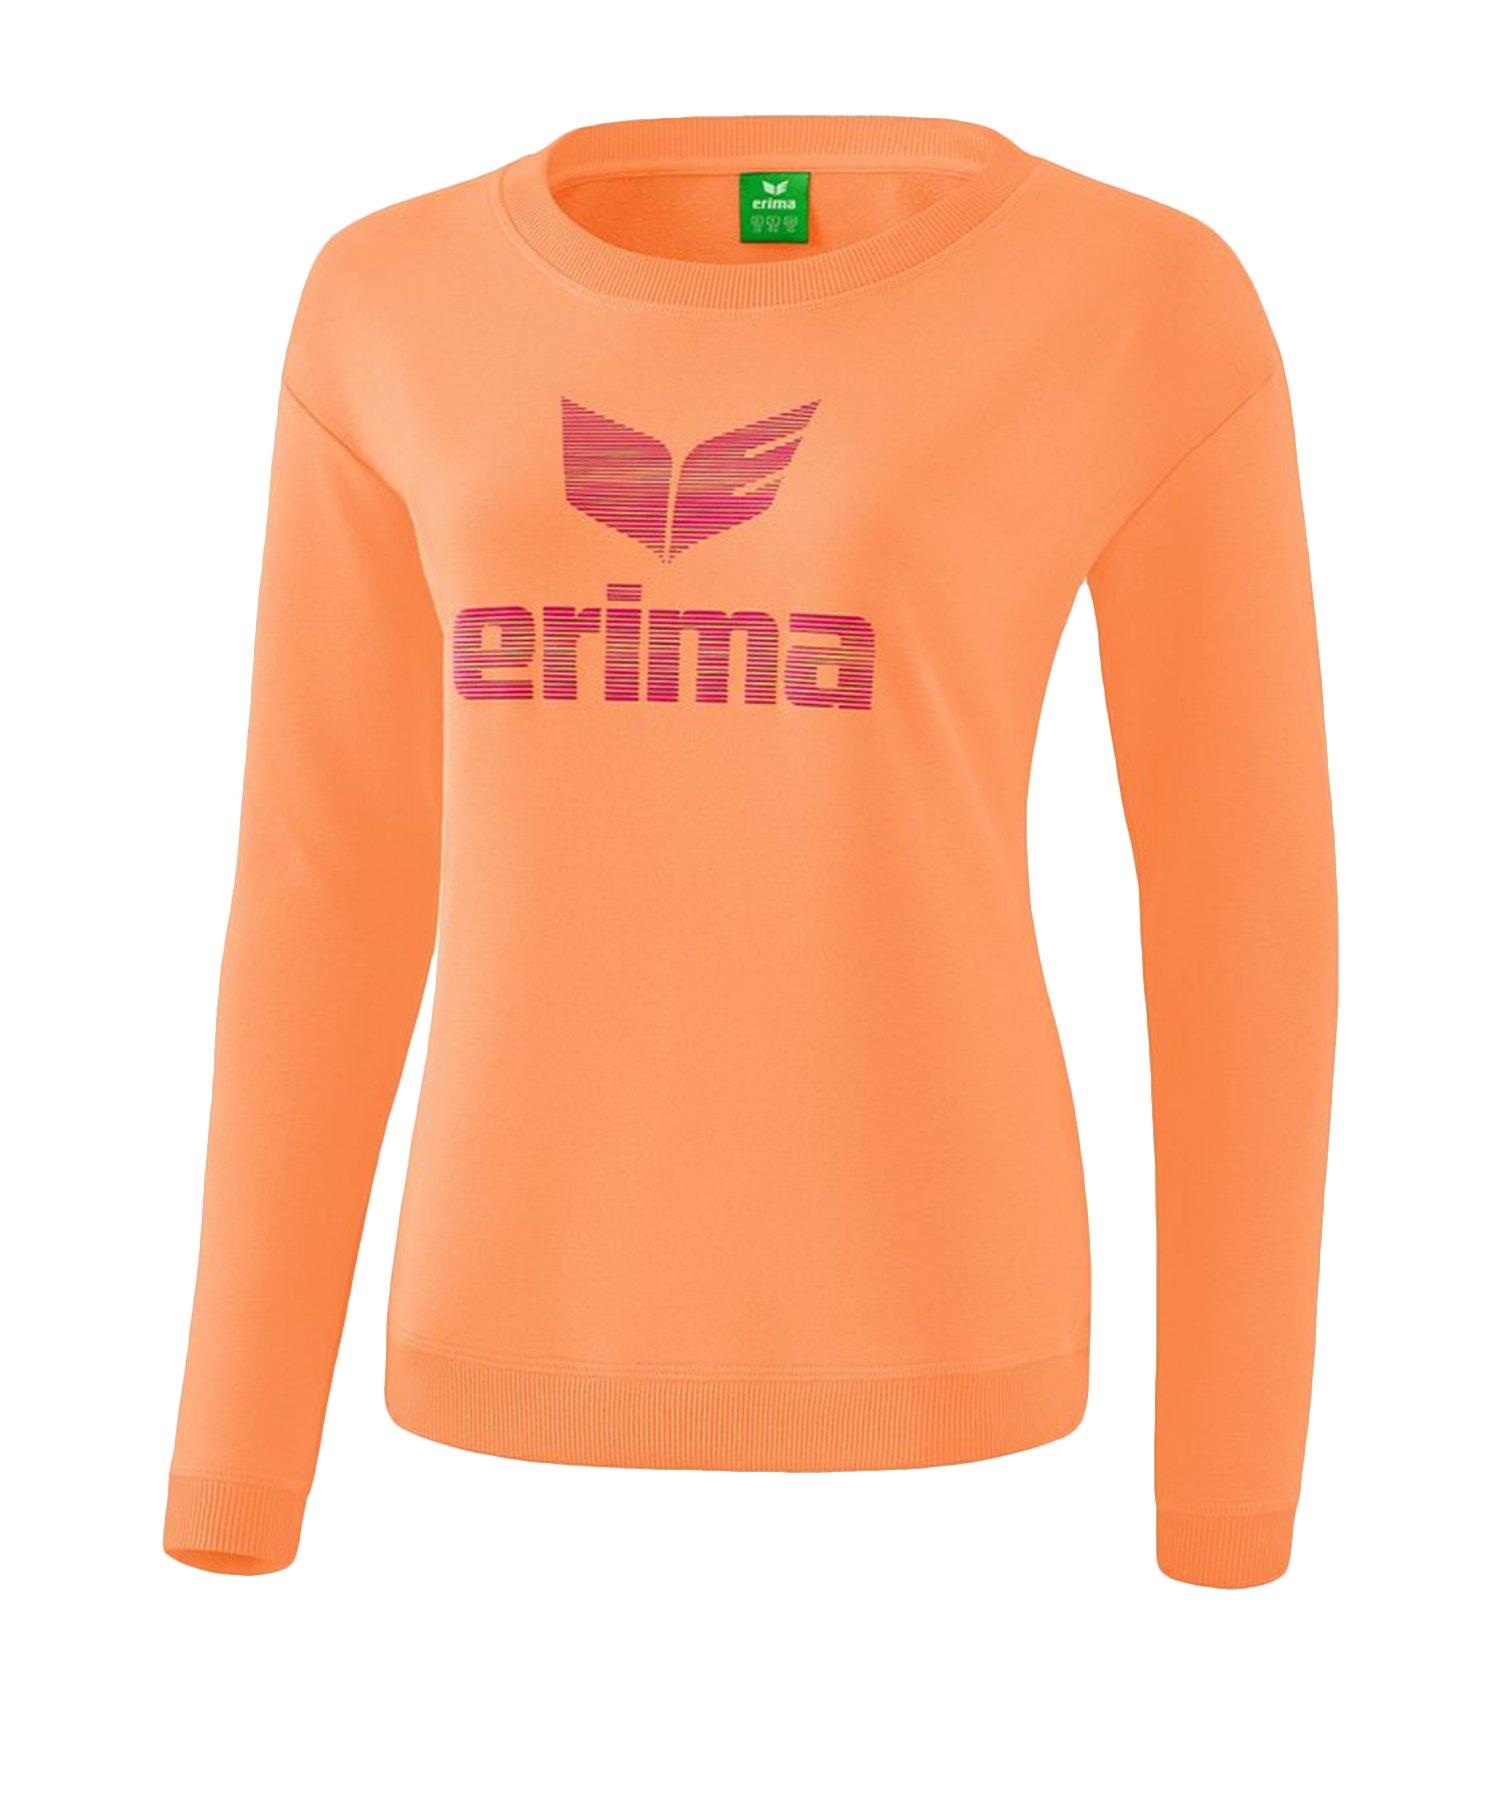 Erima Essential Sweatshirt Damen Orange - Orange